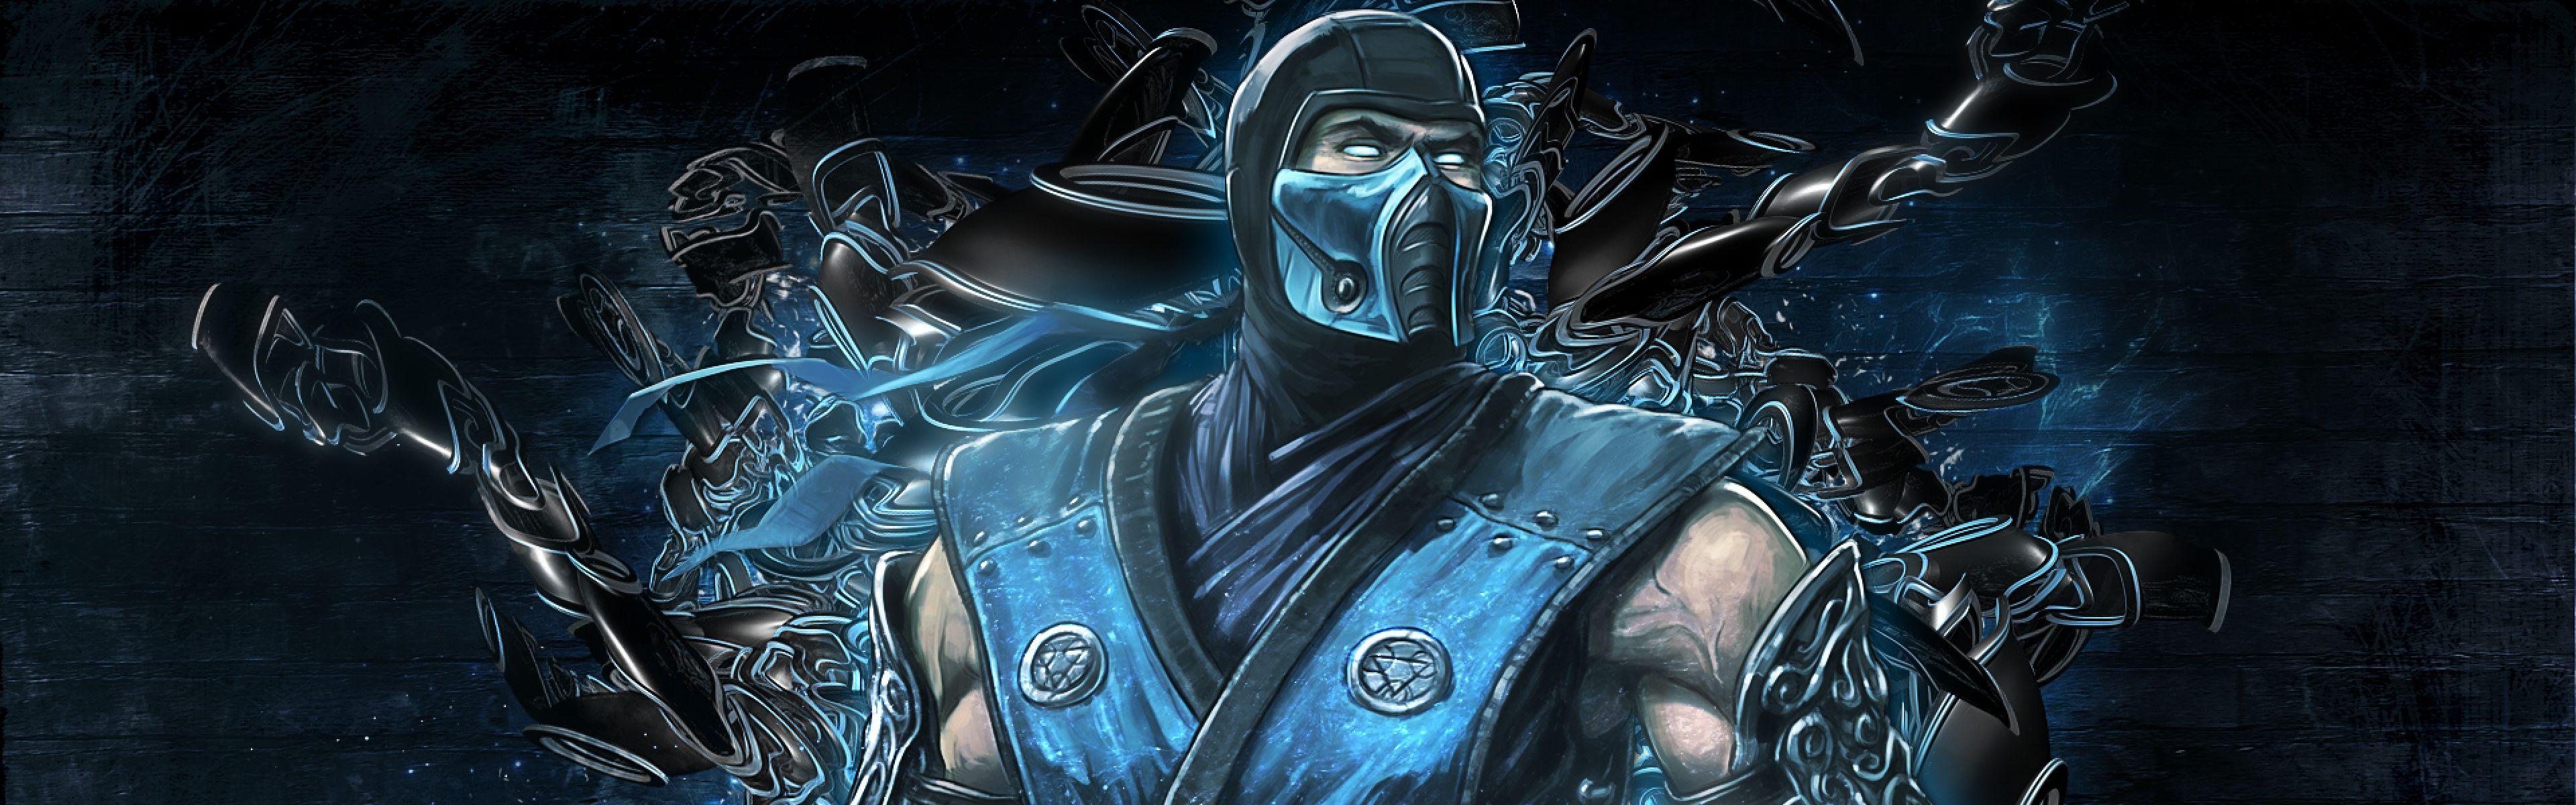 204 Mortal Kombat HD Wallpapers | Backgrounds - Wallpaper Abyss